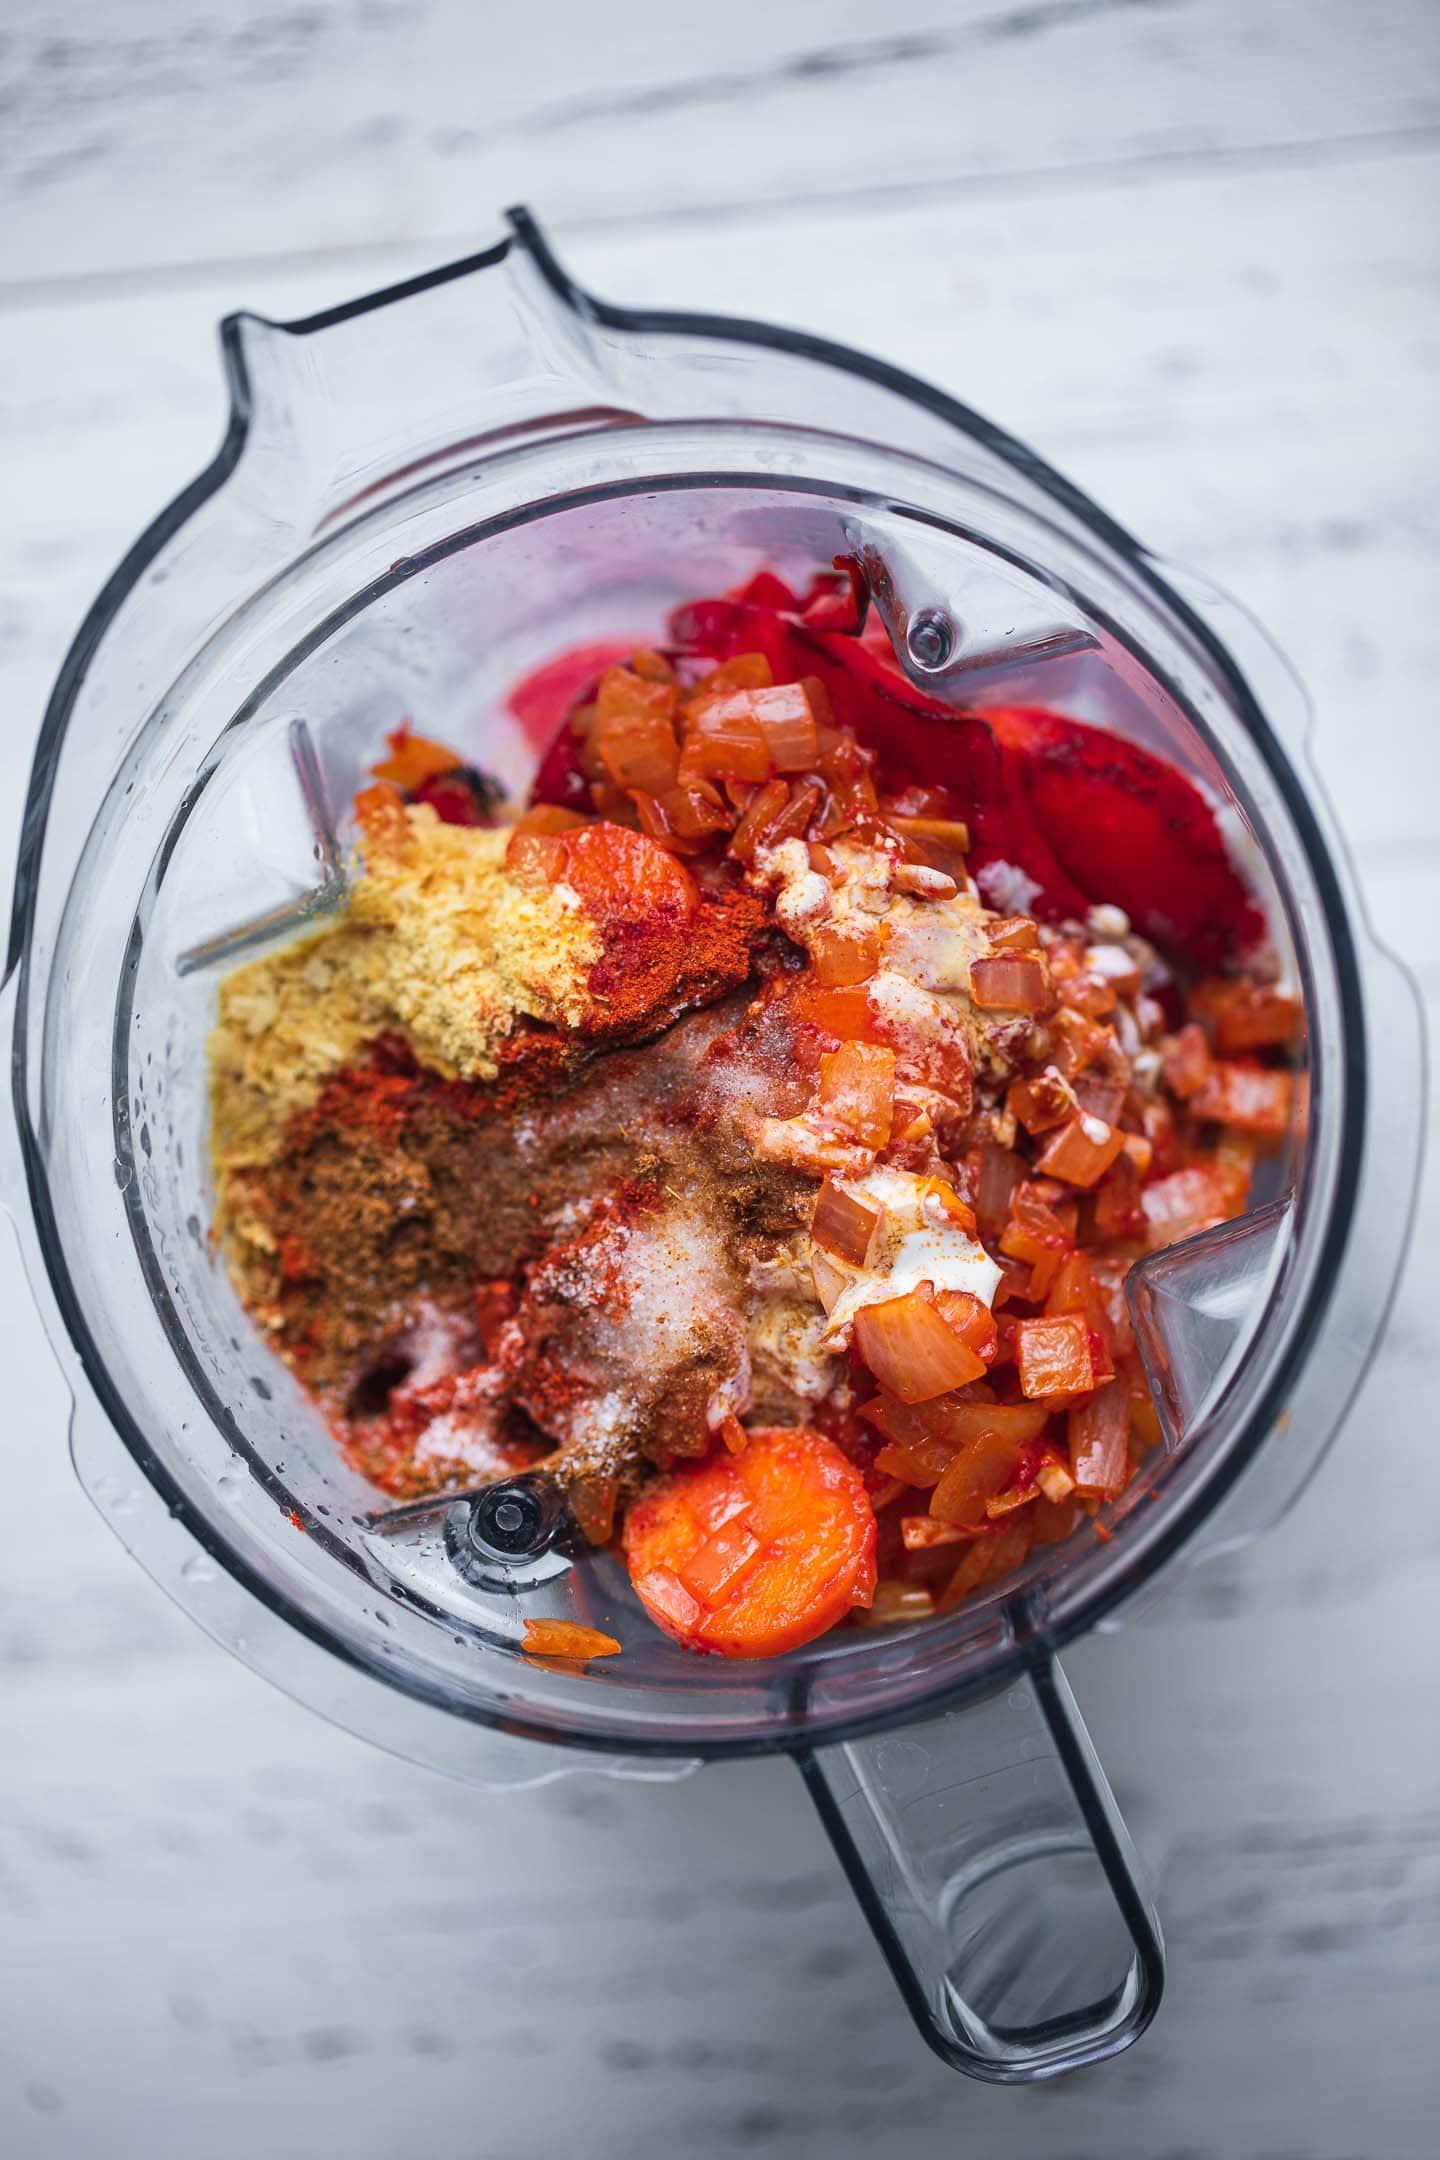 Vegan tomato bisque ingredients in a blender